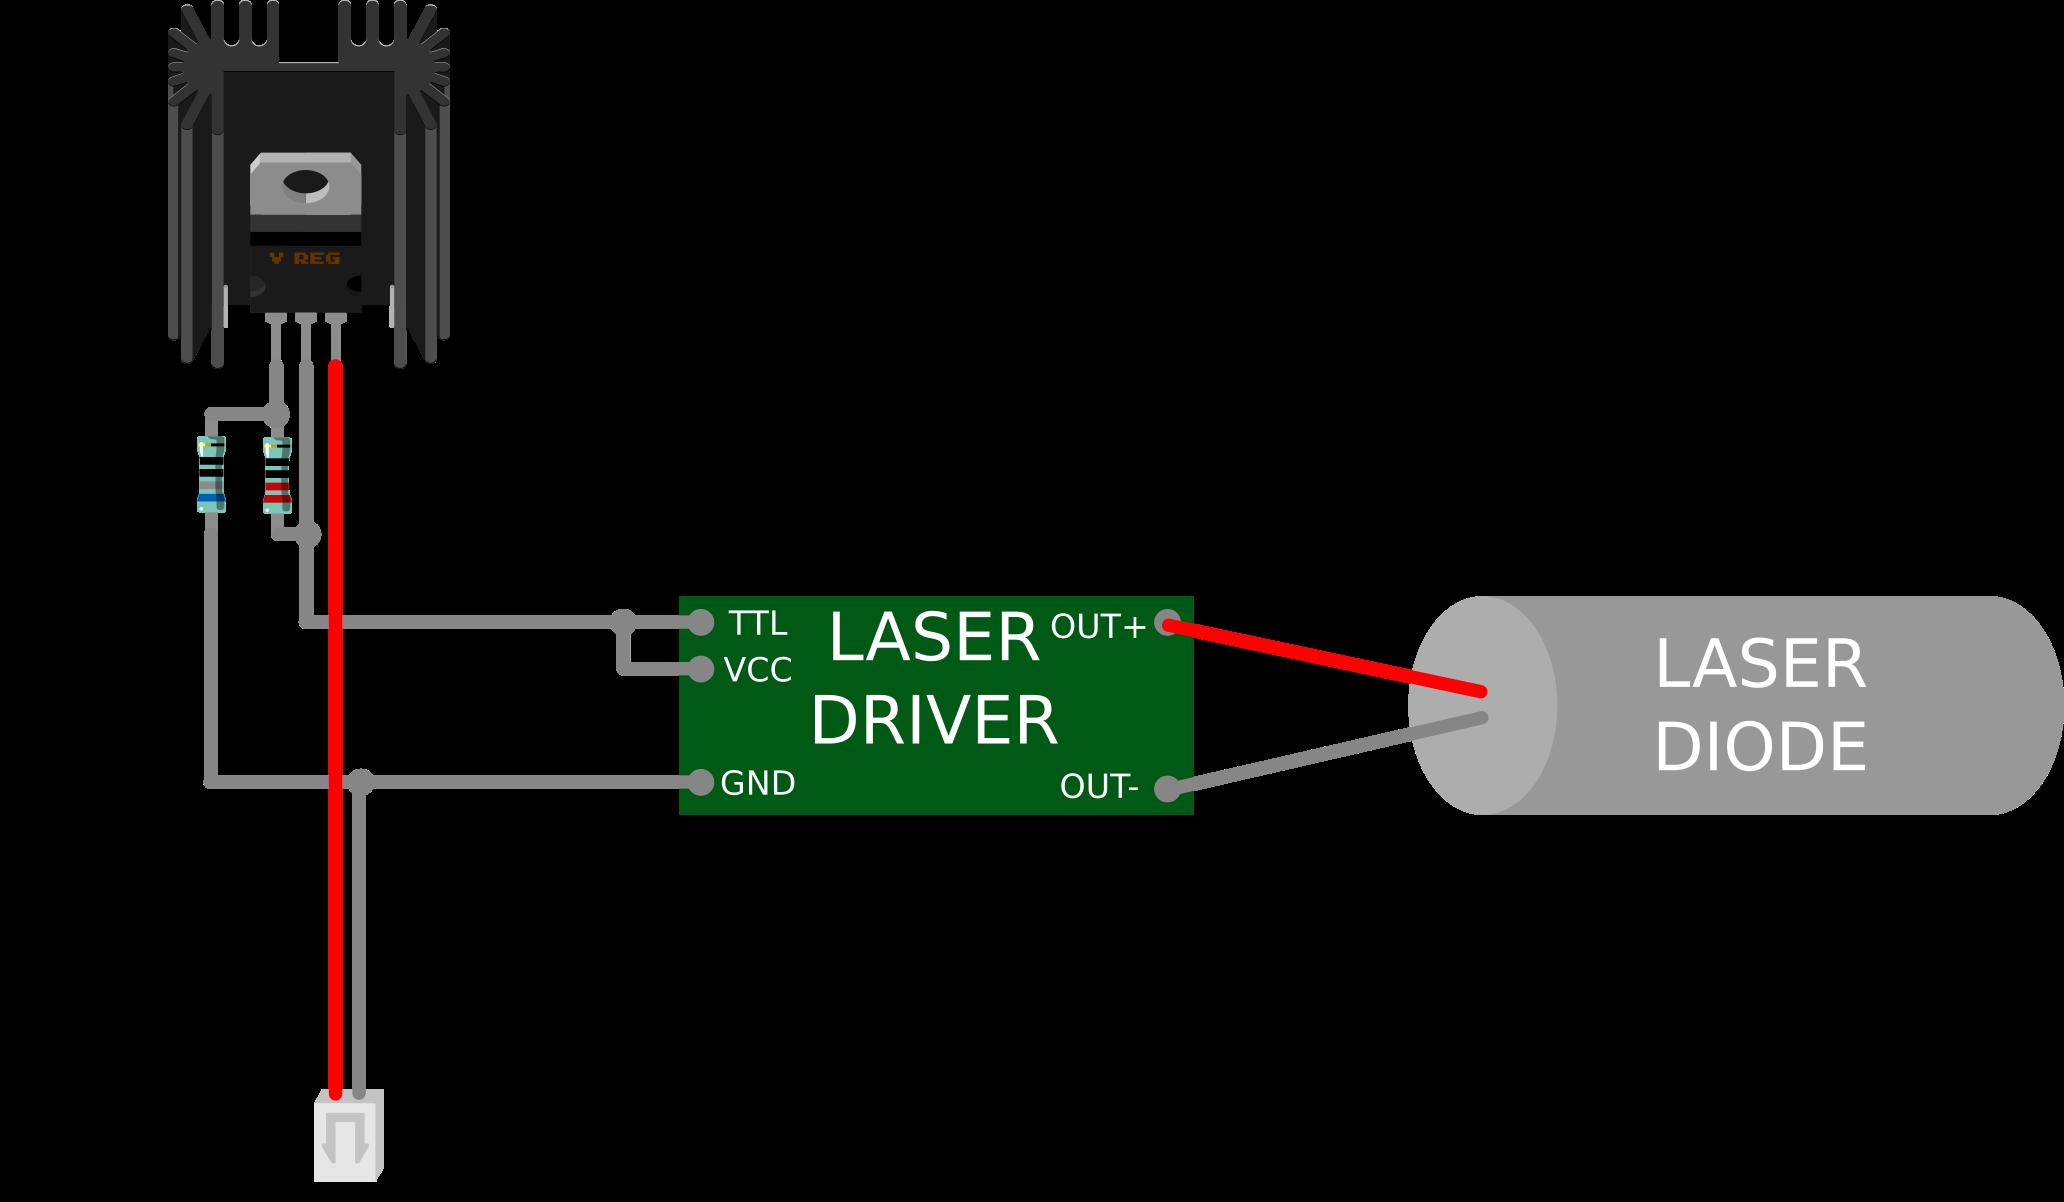 laser engraving machine wiring diagram wiring diagram operations anet a8 3d printer laser engraver mod lokster [ 2064 x 1202 Pixel ]